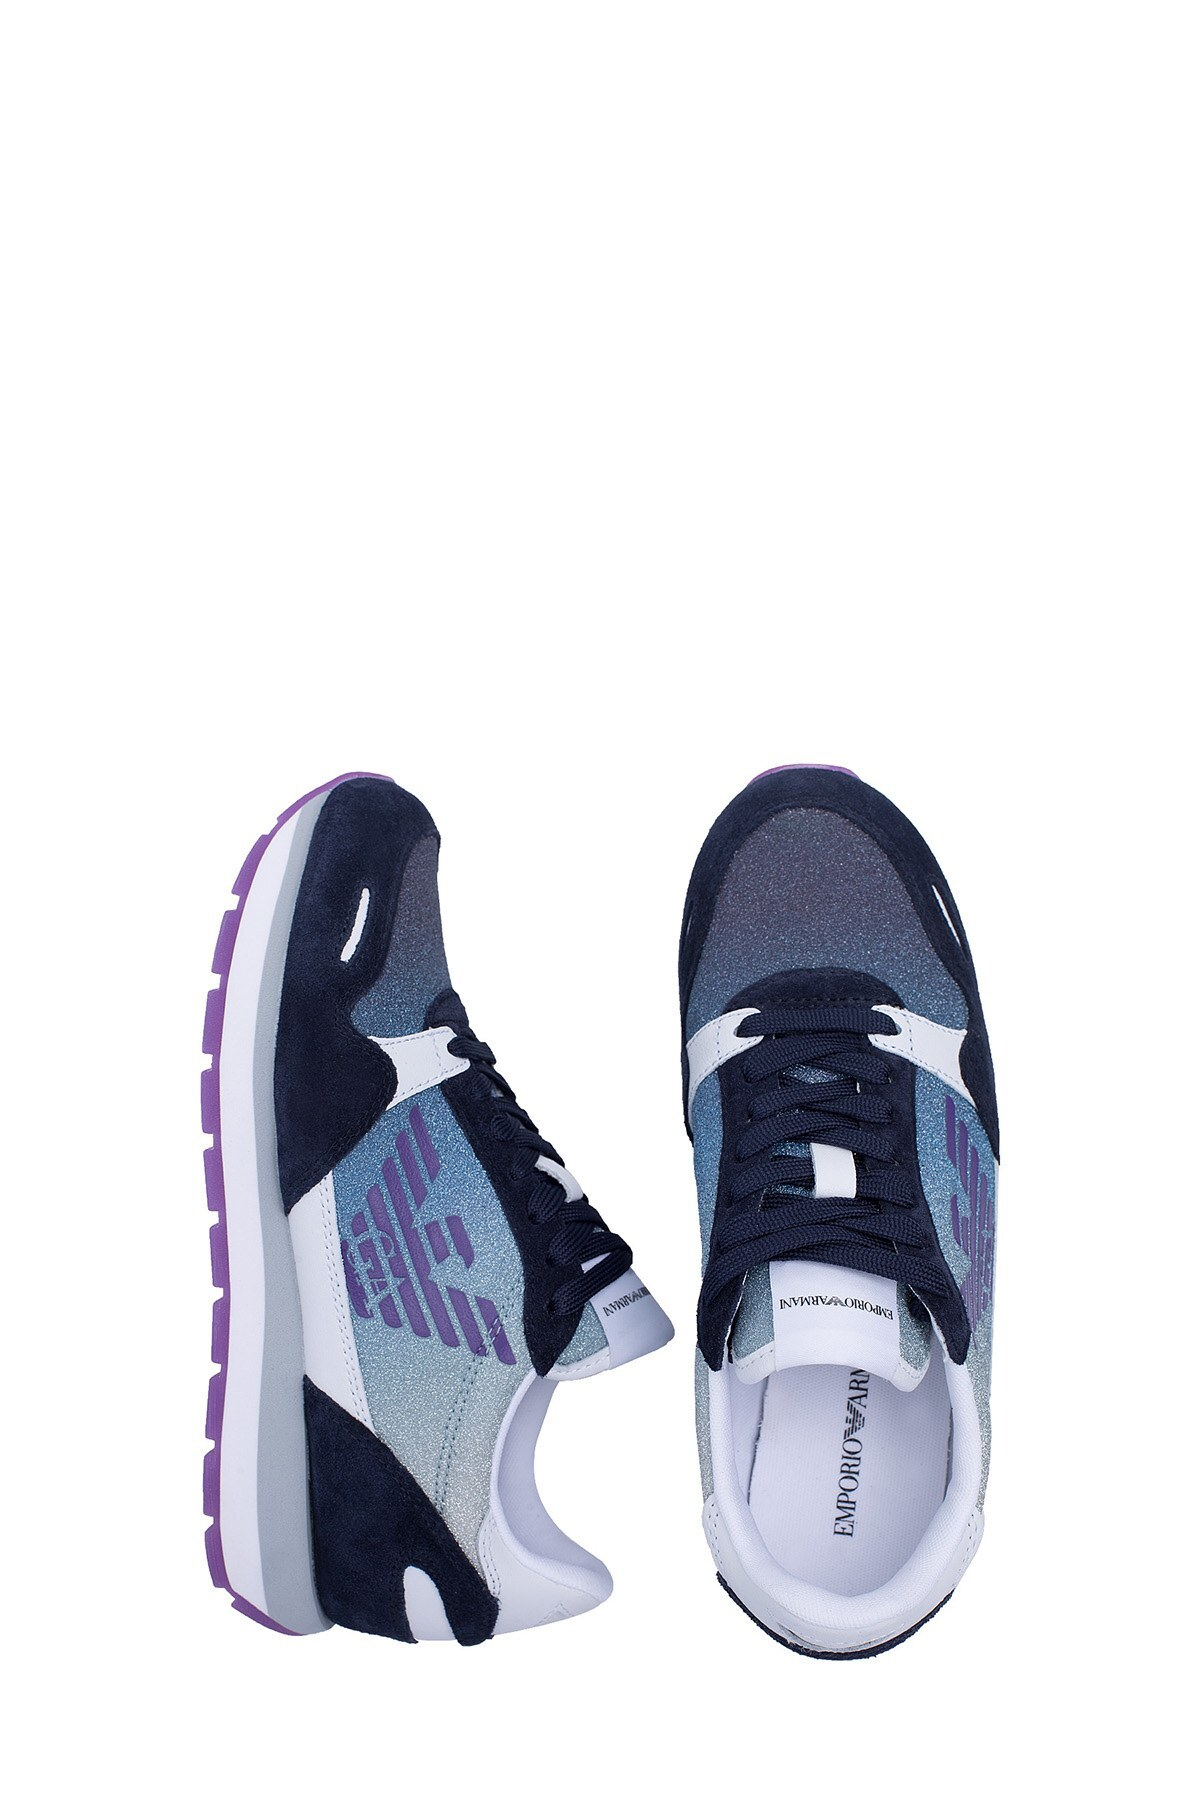 Emporio Armani Kadın Ayakkabı X3X058 XM262 R724 LACİVERT